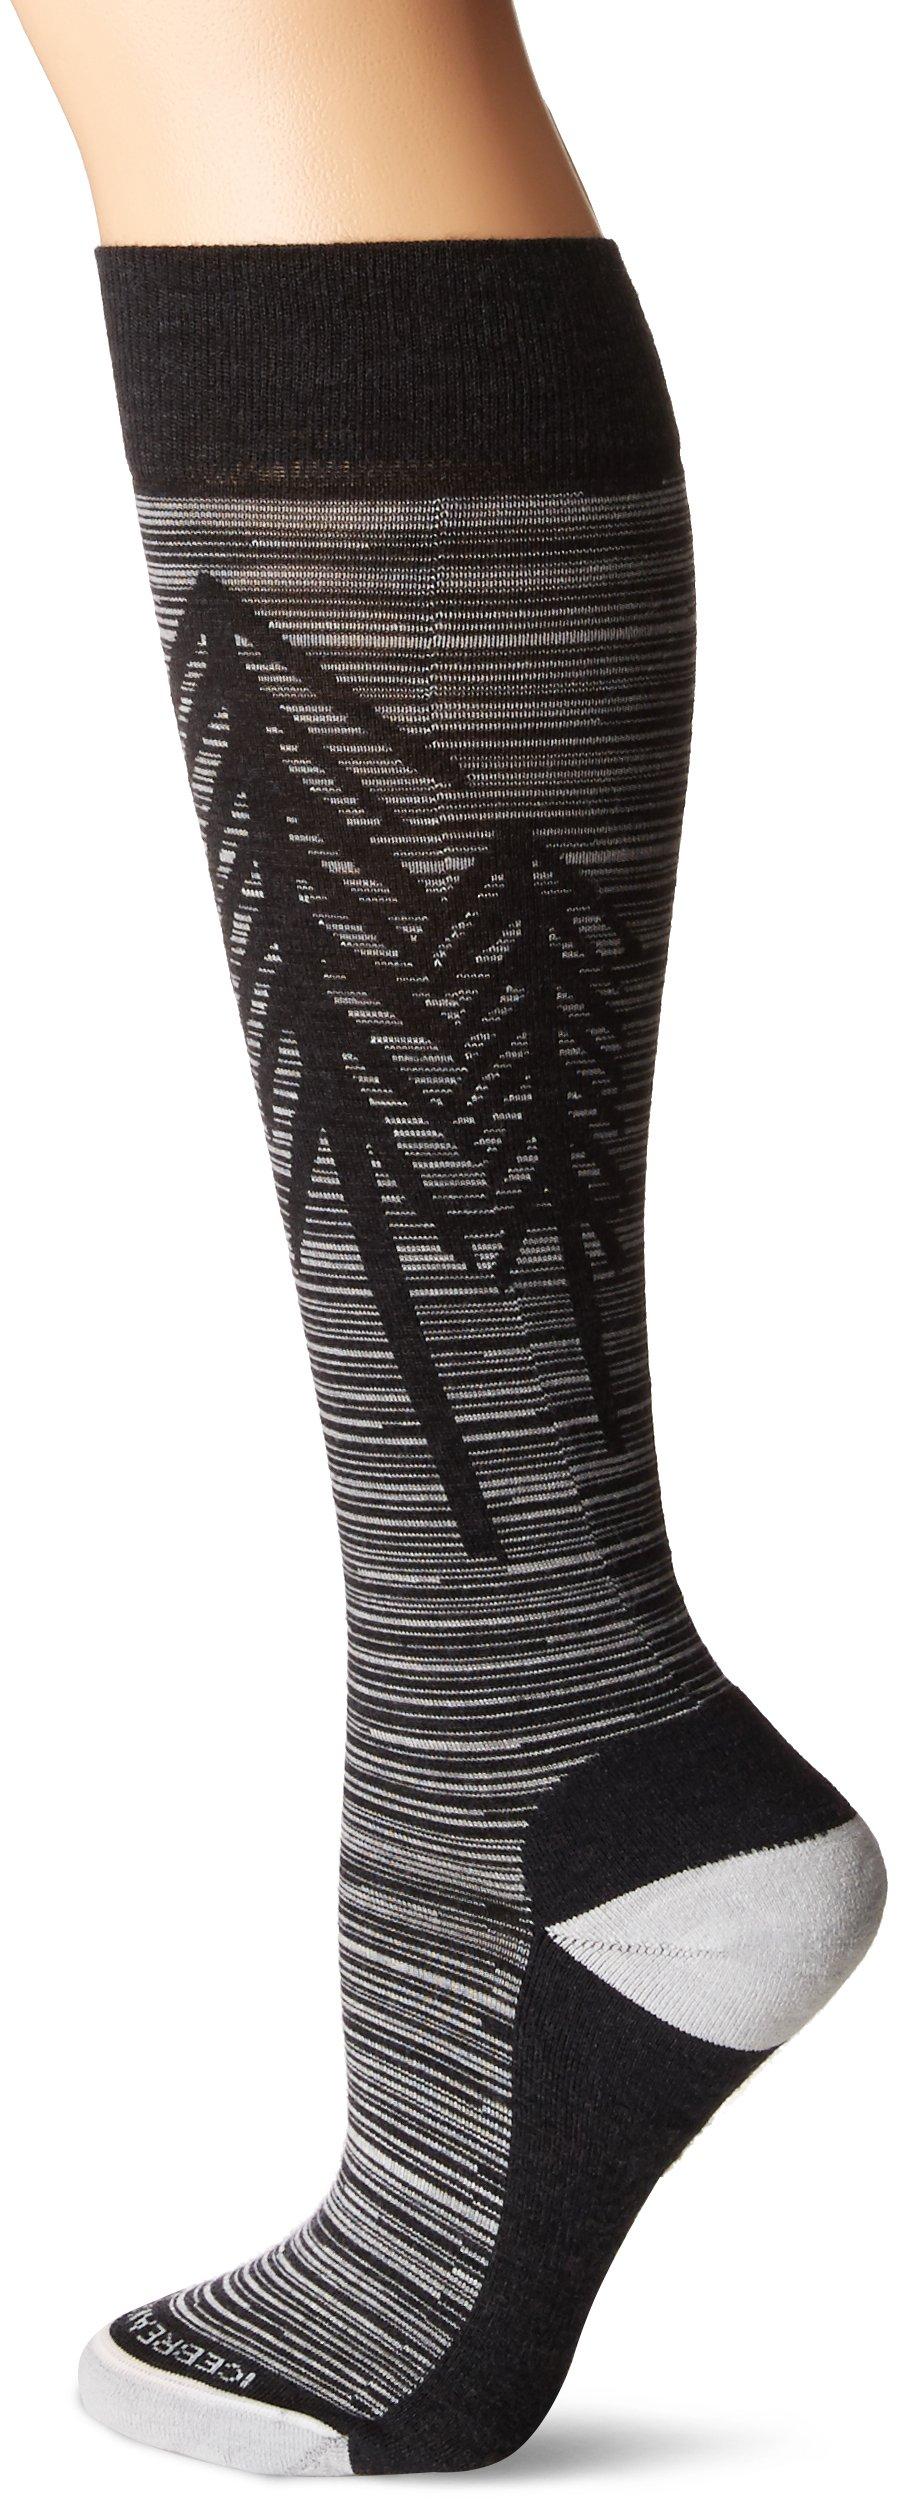 Icebreaker Merino Women's Lifestyle Light Over The Calf Socks, Jet Heather/Snow, Medium